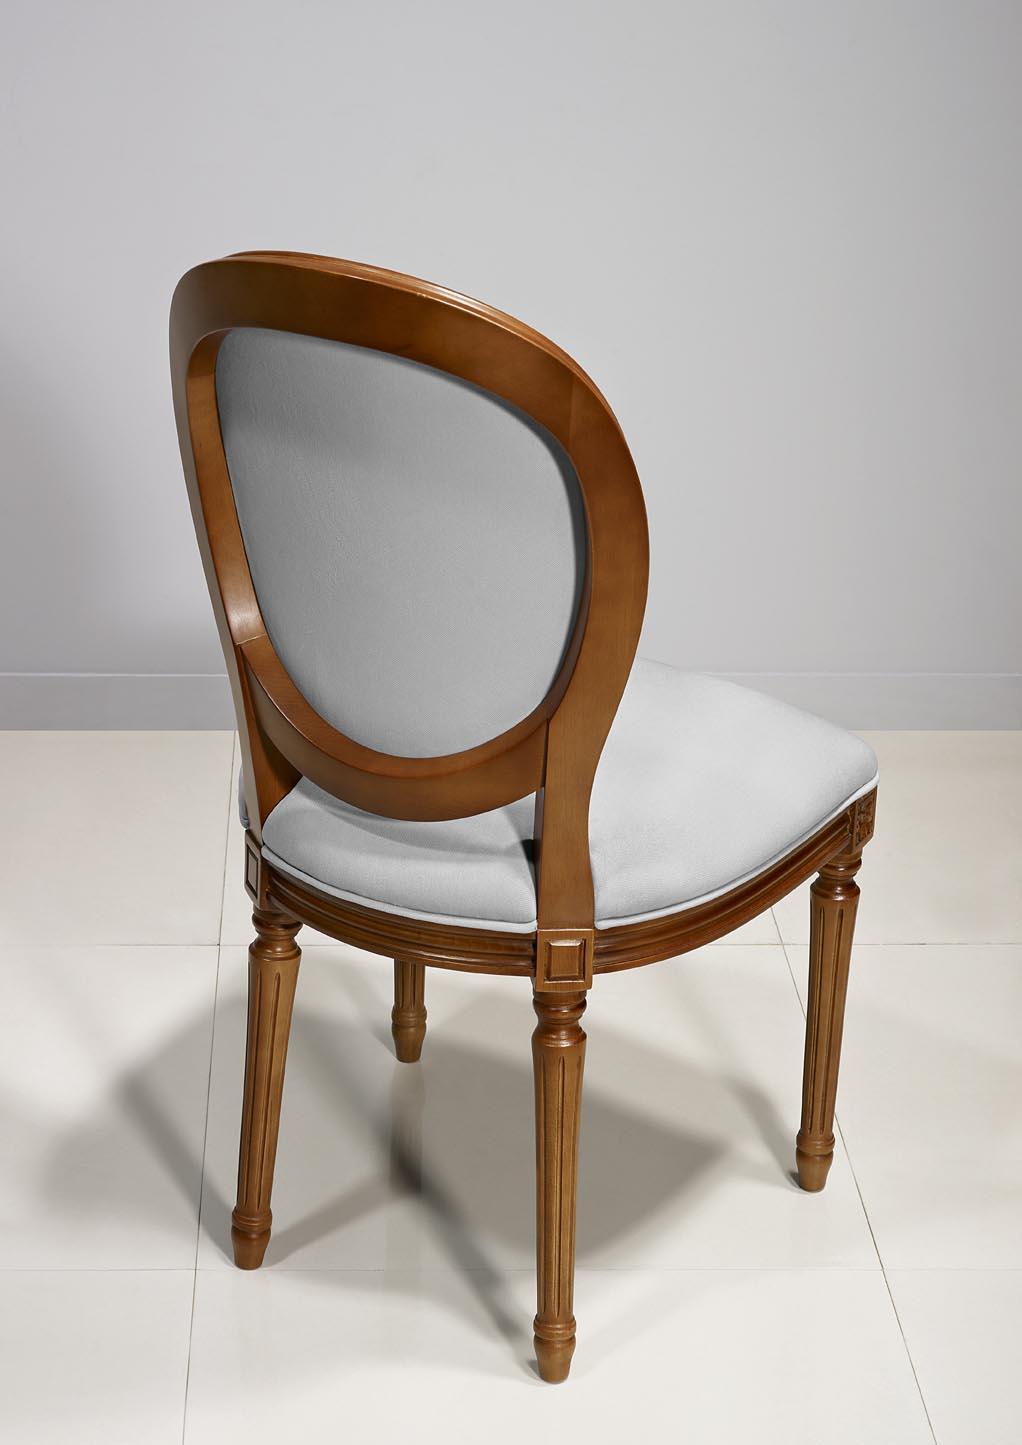 Chaise emeline en merisier massif de style louis xvi for Chaise meuble